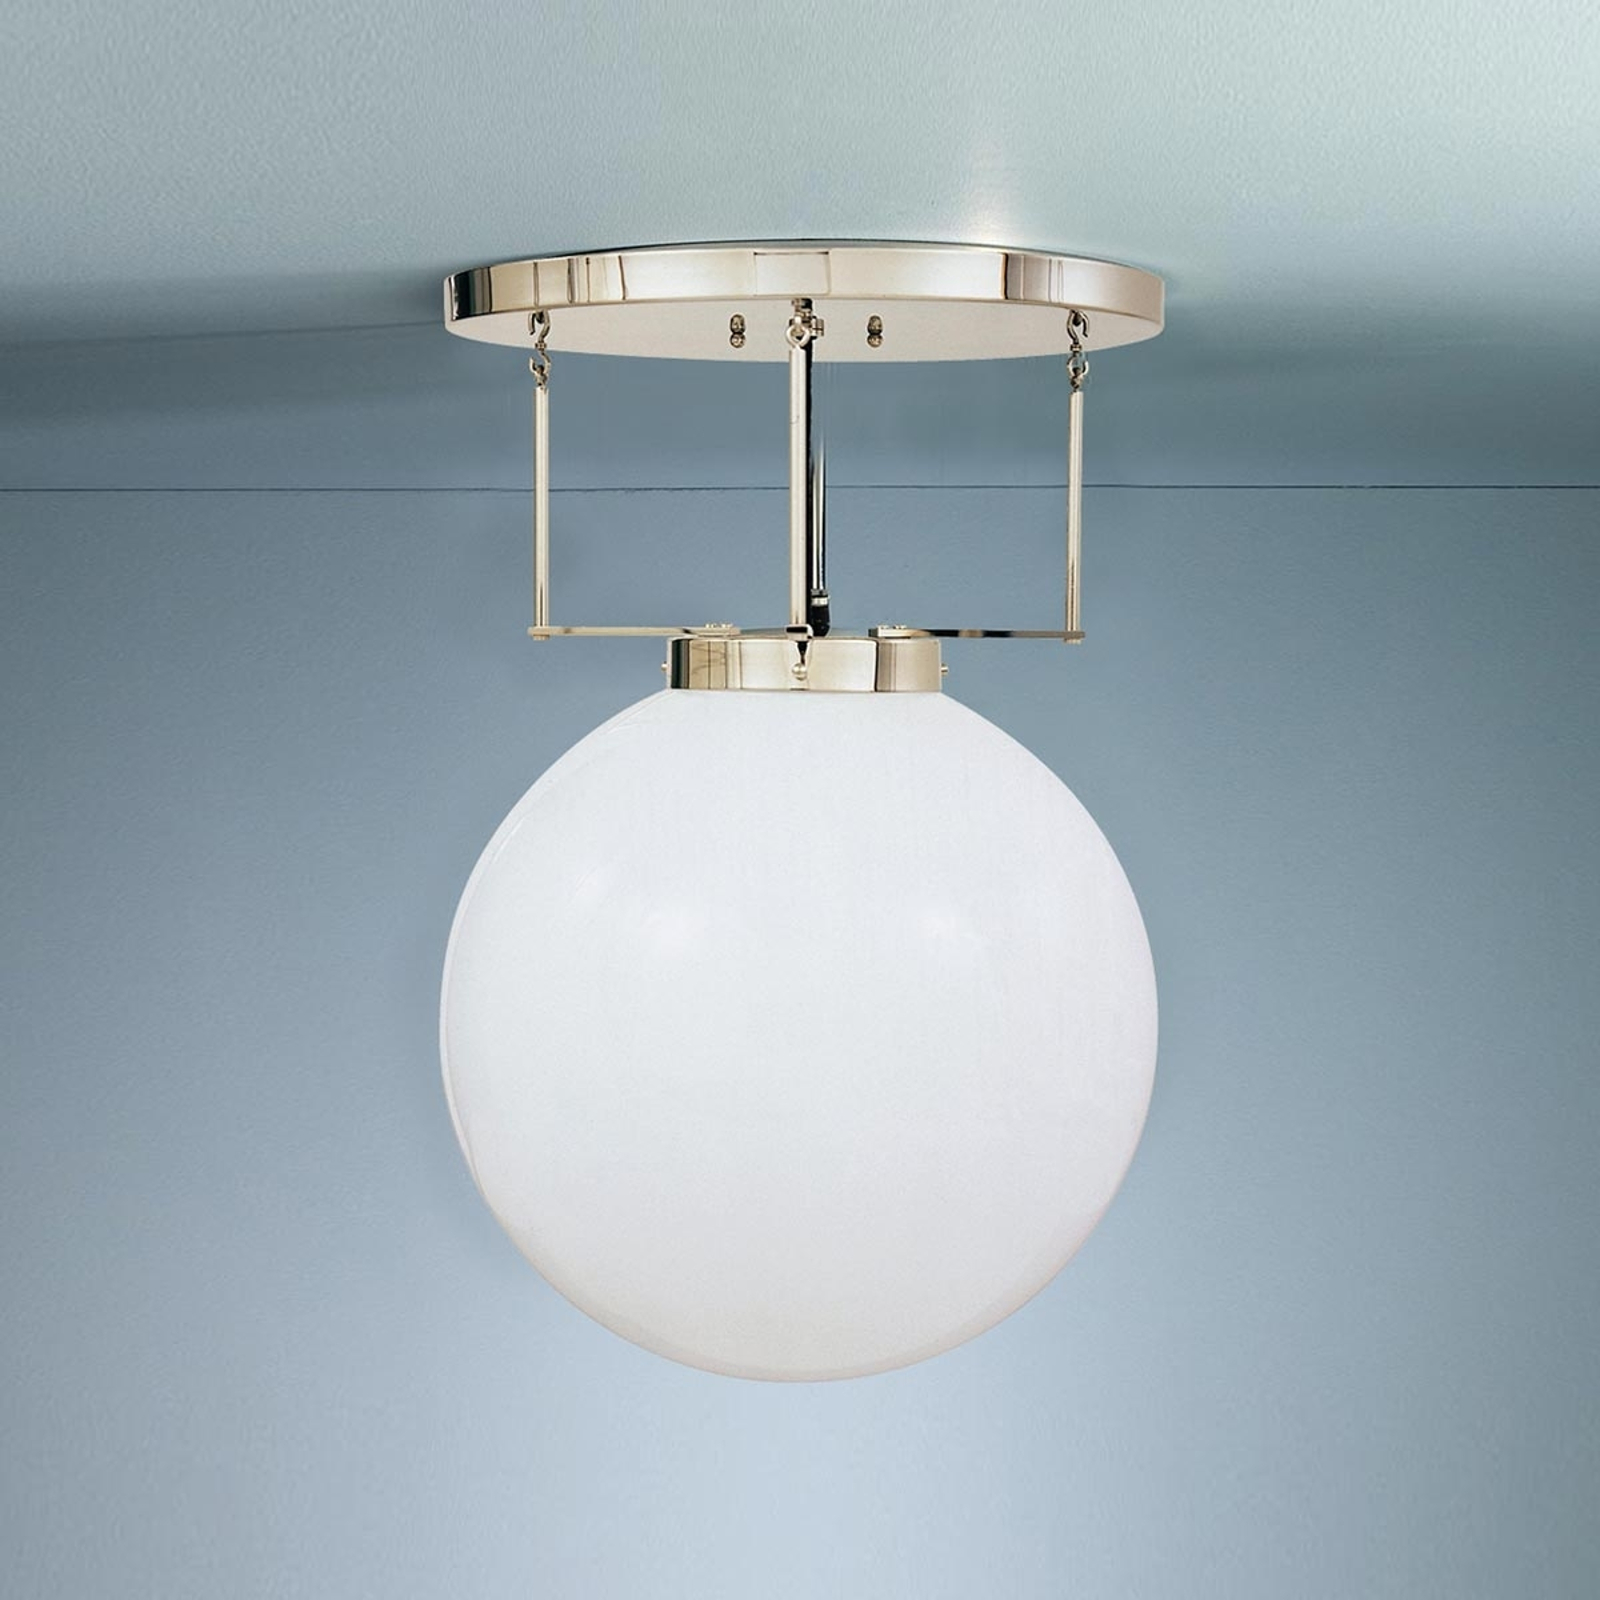 Lampa sufitowa w stylu Bauhaus 25 cm mosiądz